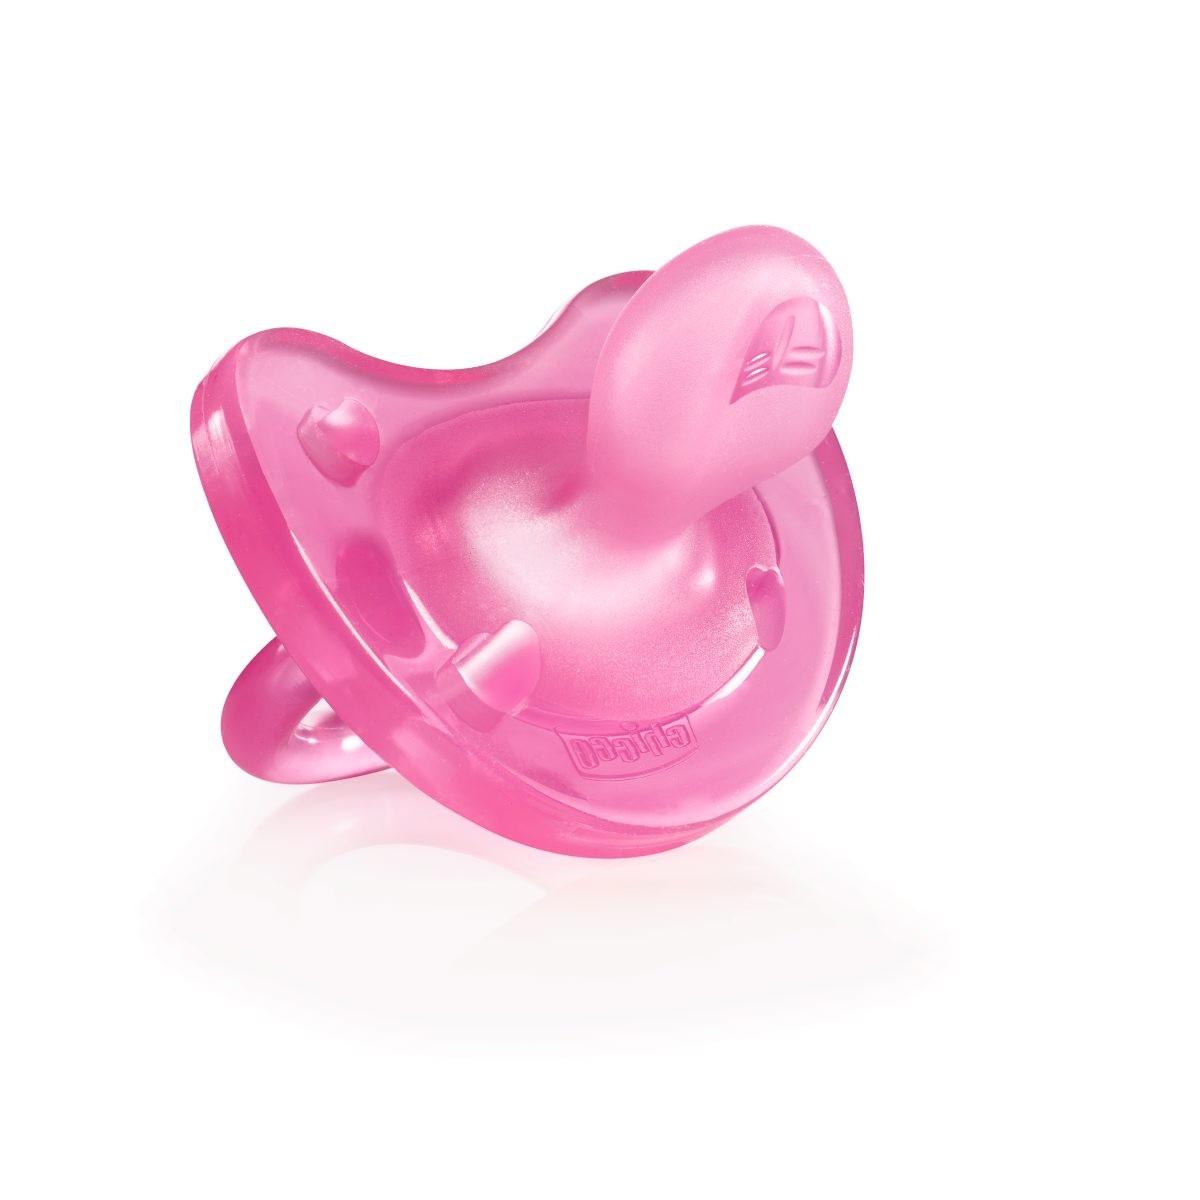 Чикко/chicco пустышка силикон физио софт розовая 0+мес (0067/0151)